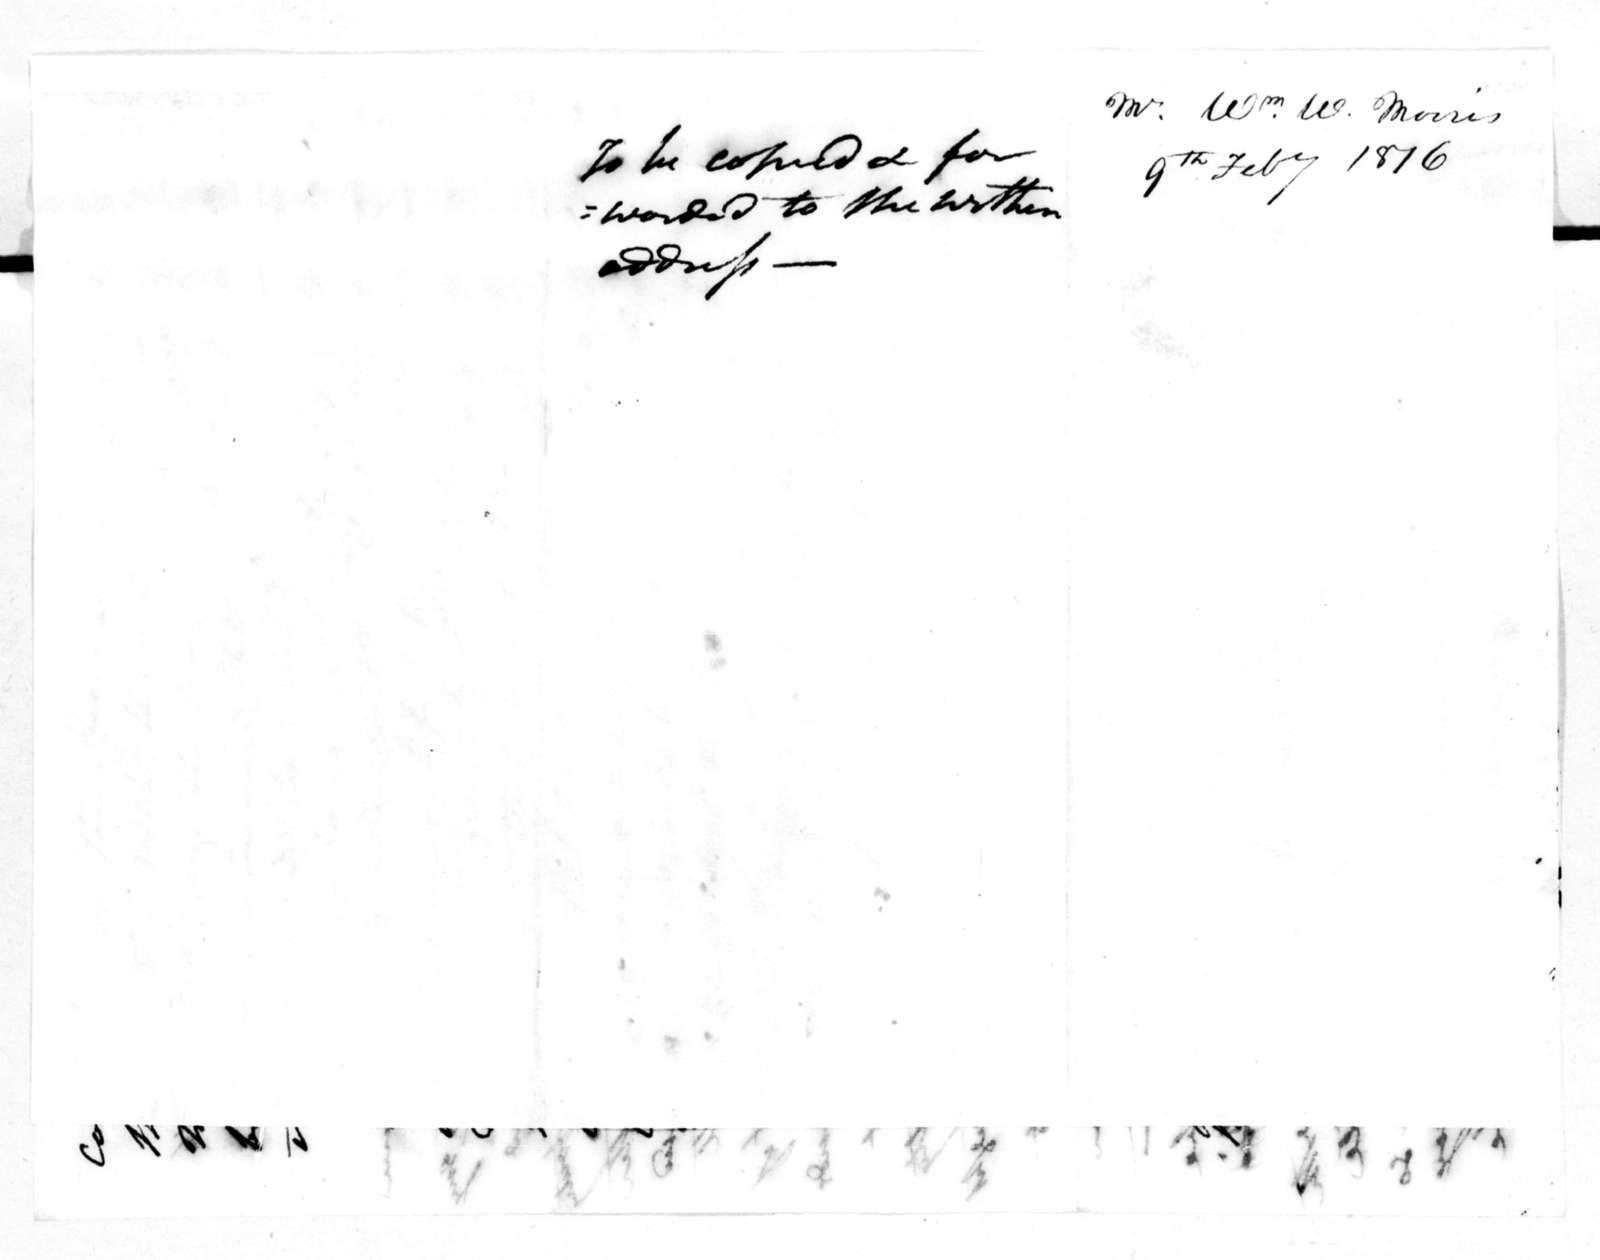 Andrew Jackson to William W. Morris, February 9, 1816